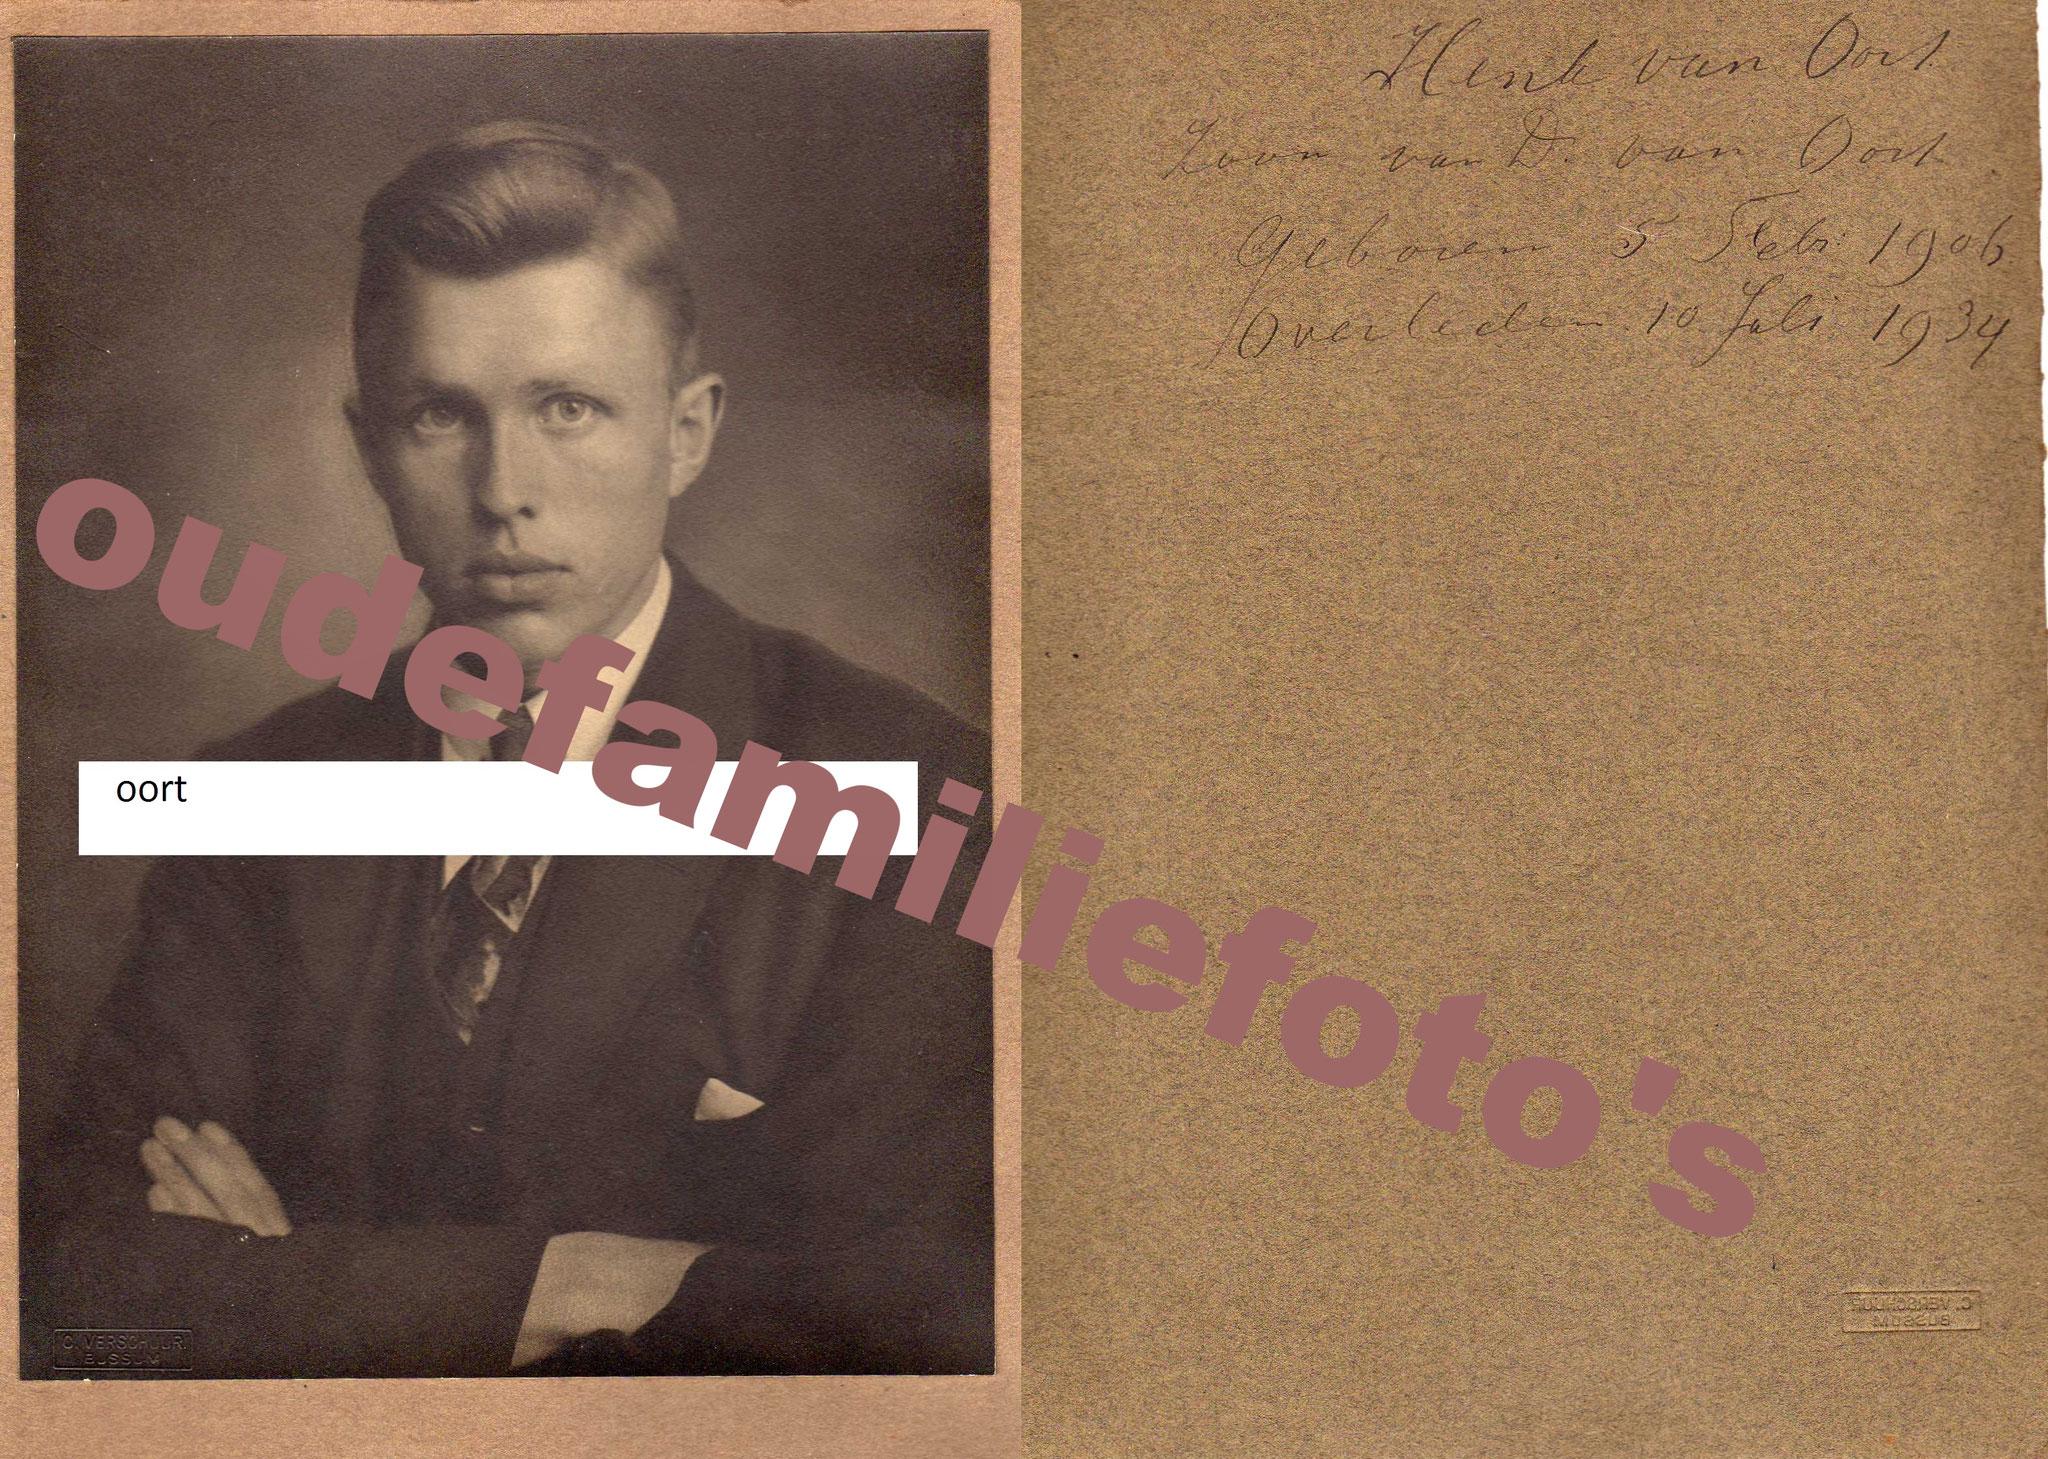 Oort van, Hendrik Dirk. Geboren op 05-02-1906 te Amsterdam, overleden op 10-07-1934 te Amsterdam € 3.00